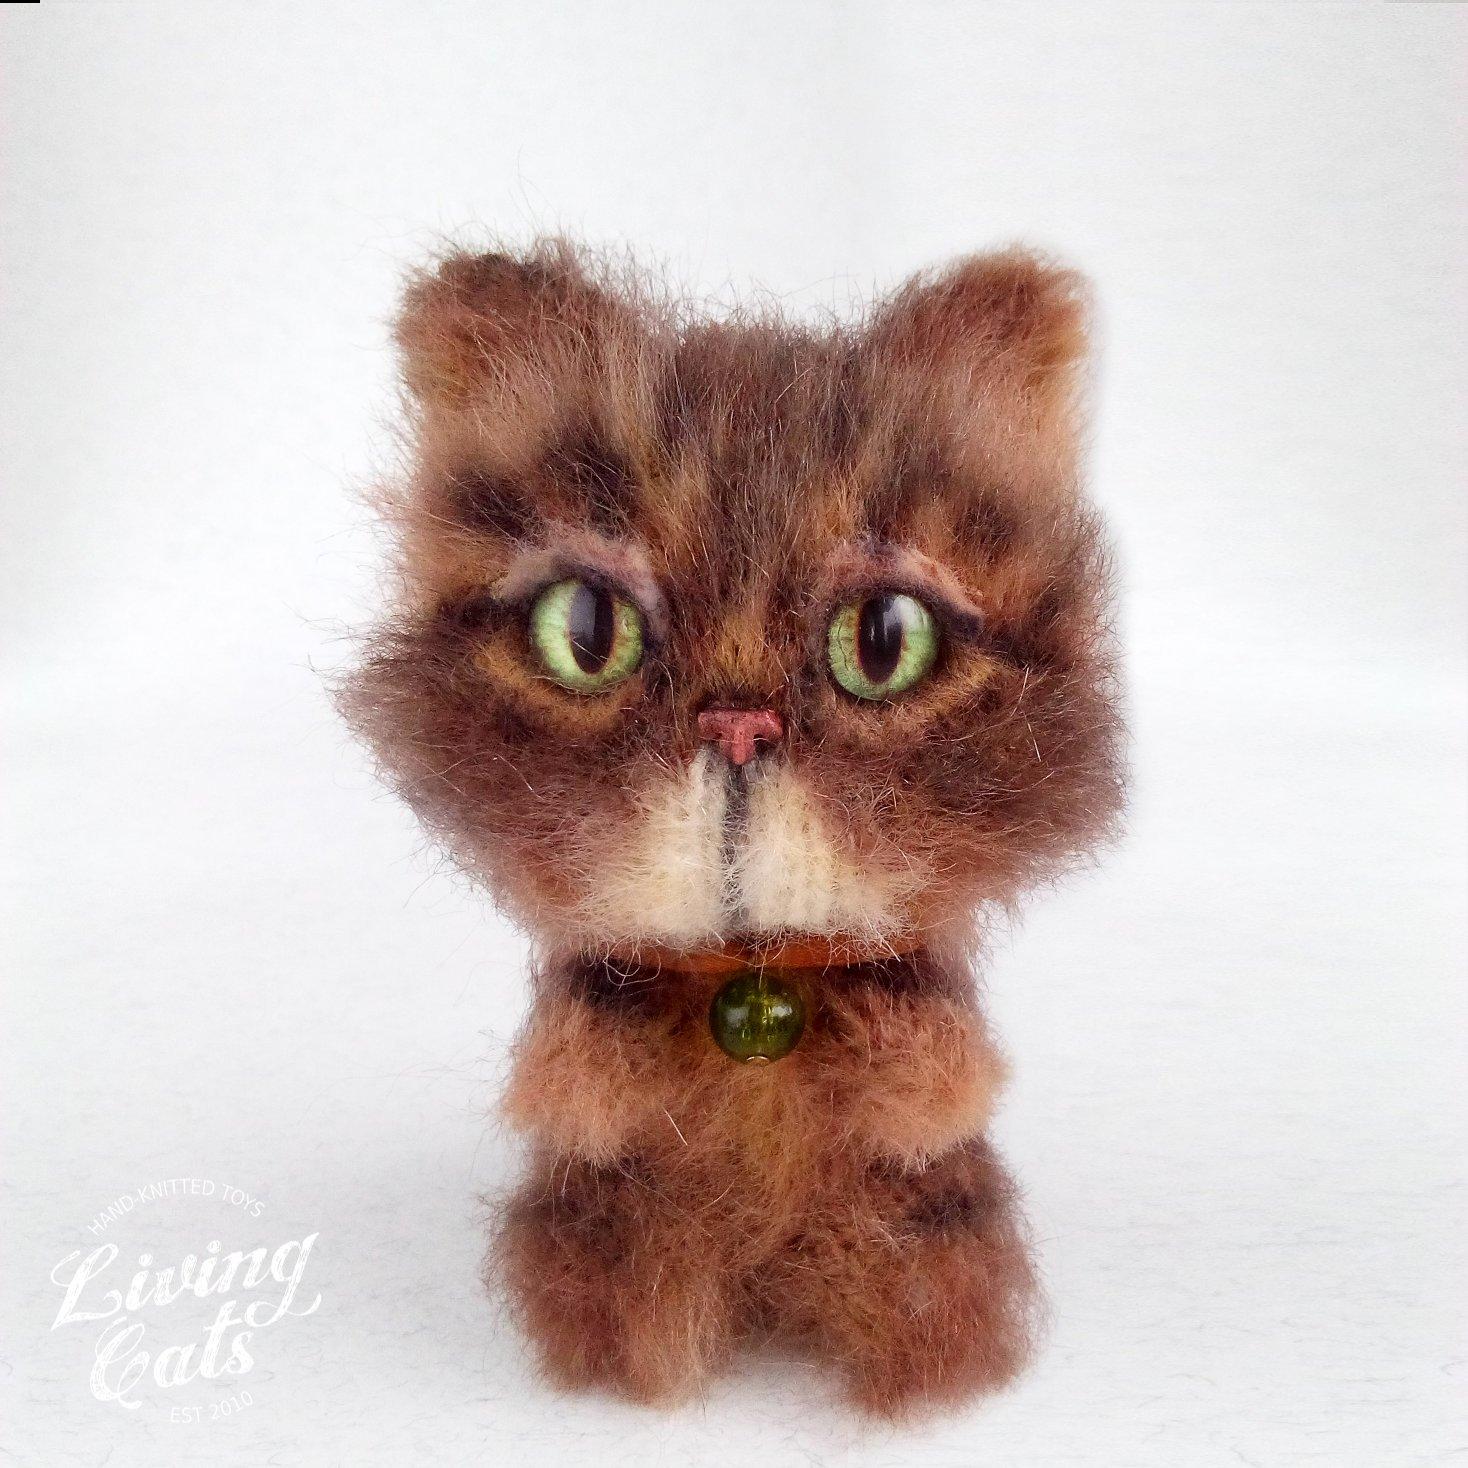 Image of Tabby cat plush, knit toy yarn cat, soft kitty, cat figurine, stuff cute kitten, cat lover gift